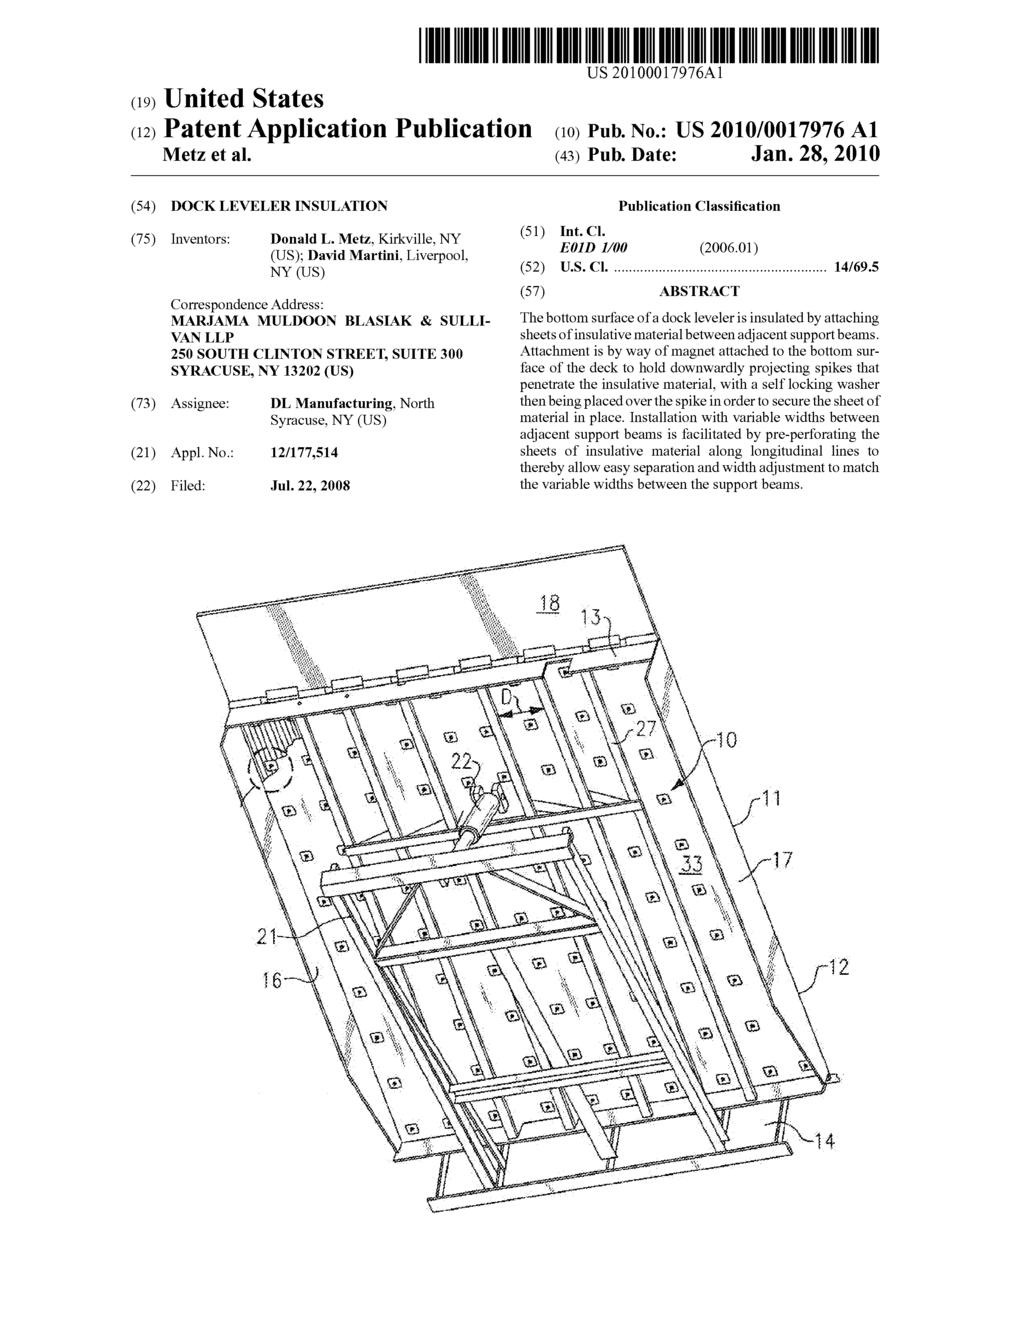 hight resolution of dock leveler insulation diagram schematic and image 01 dock leveler brush seals dock leveler schematic